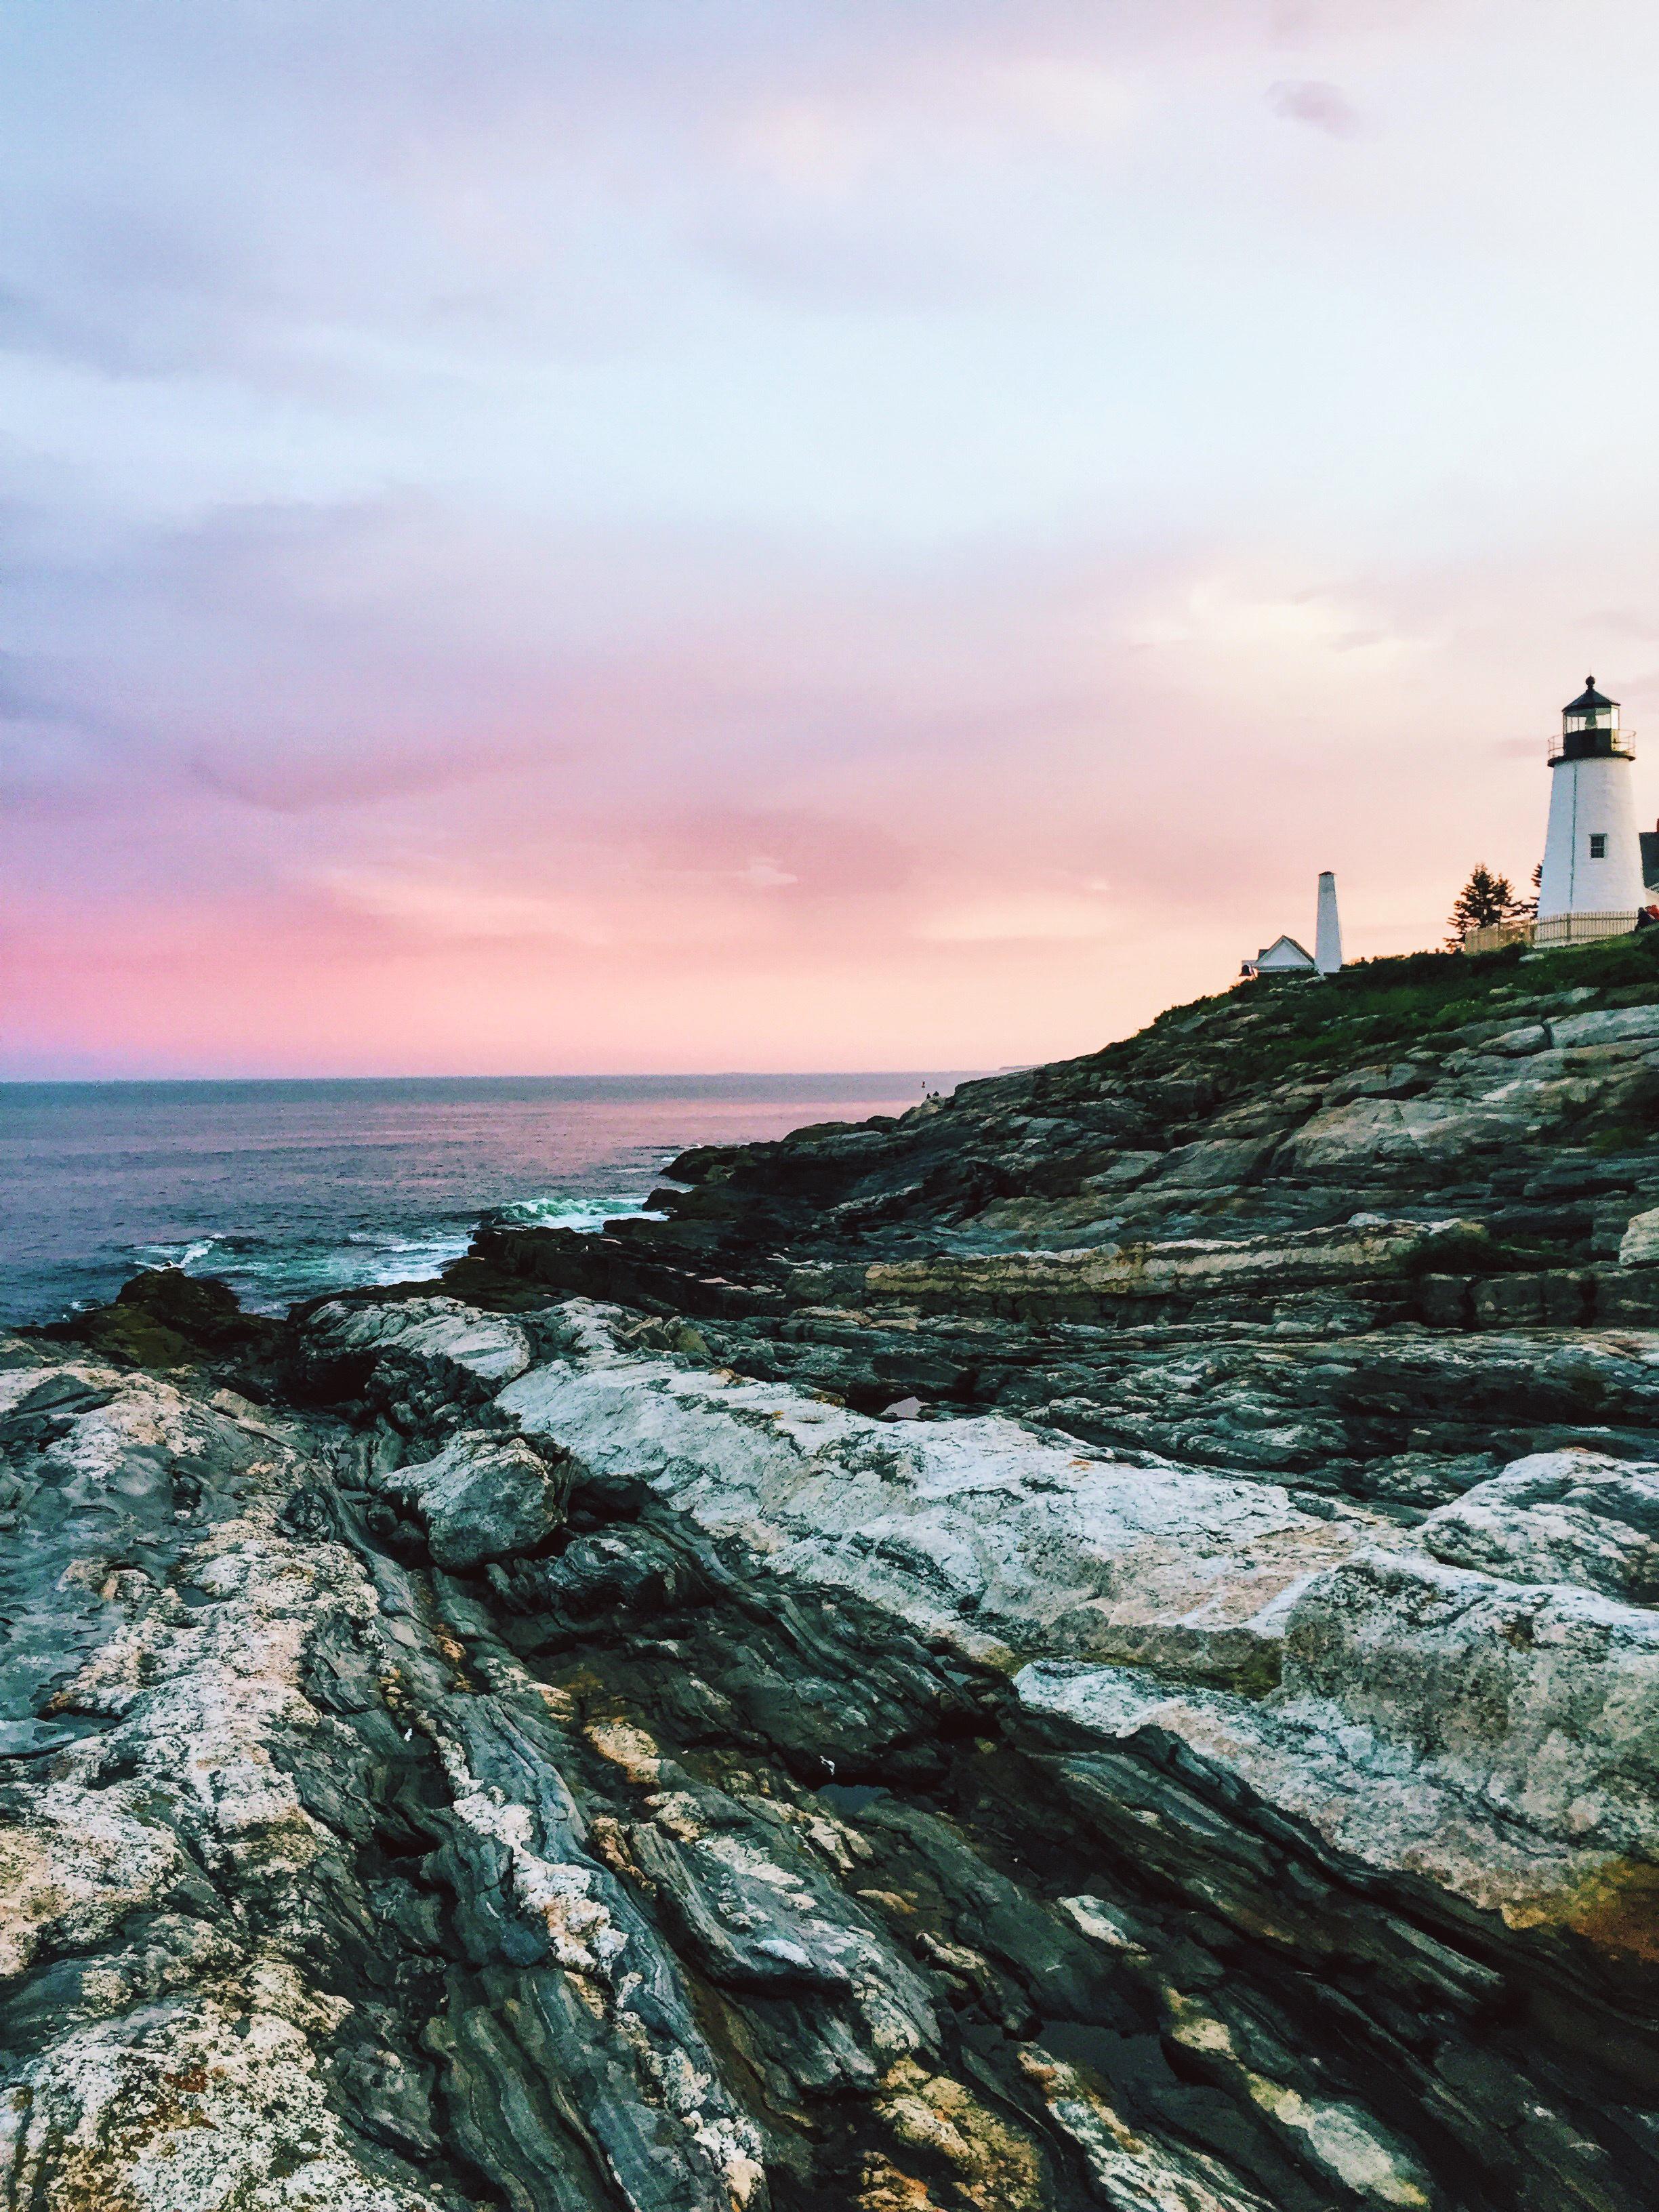 Blogging Journey | Creative Entrepreneur | Summer In Maine | Travel Blogger | Maine Lighthouse | Coast of Maine | Sunset over the Ocean | Photo Inspiration via @elanaloo + elanaloo.com